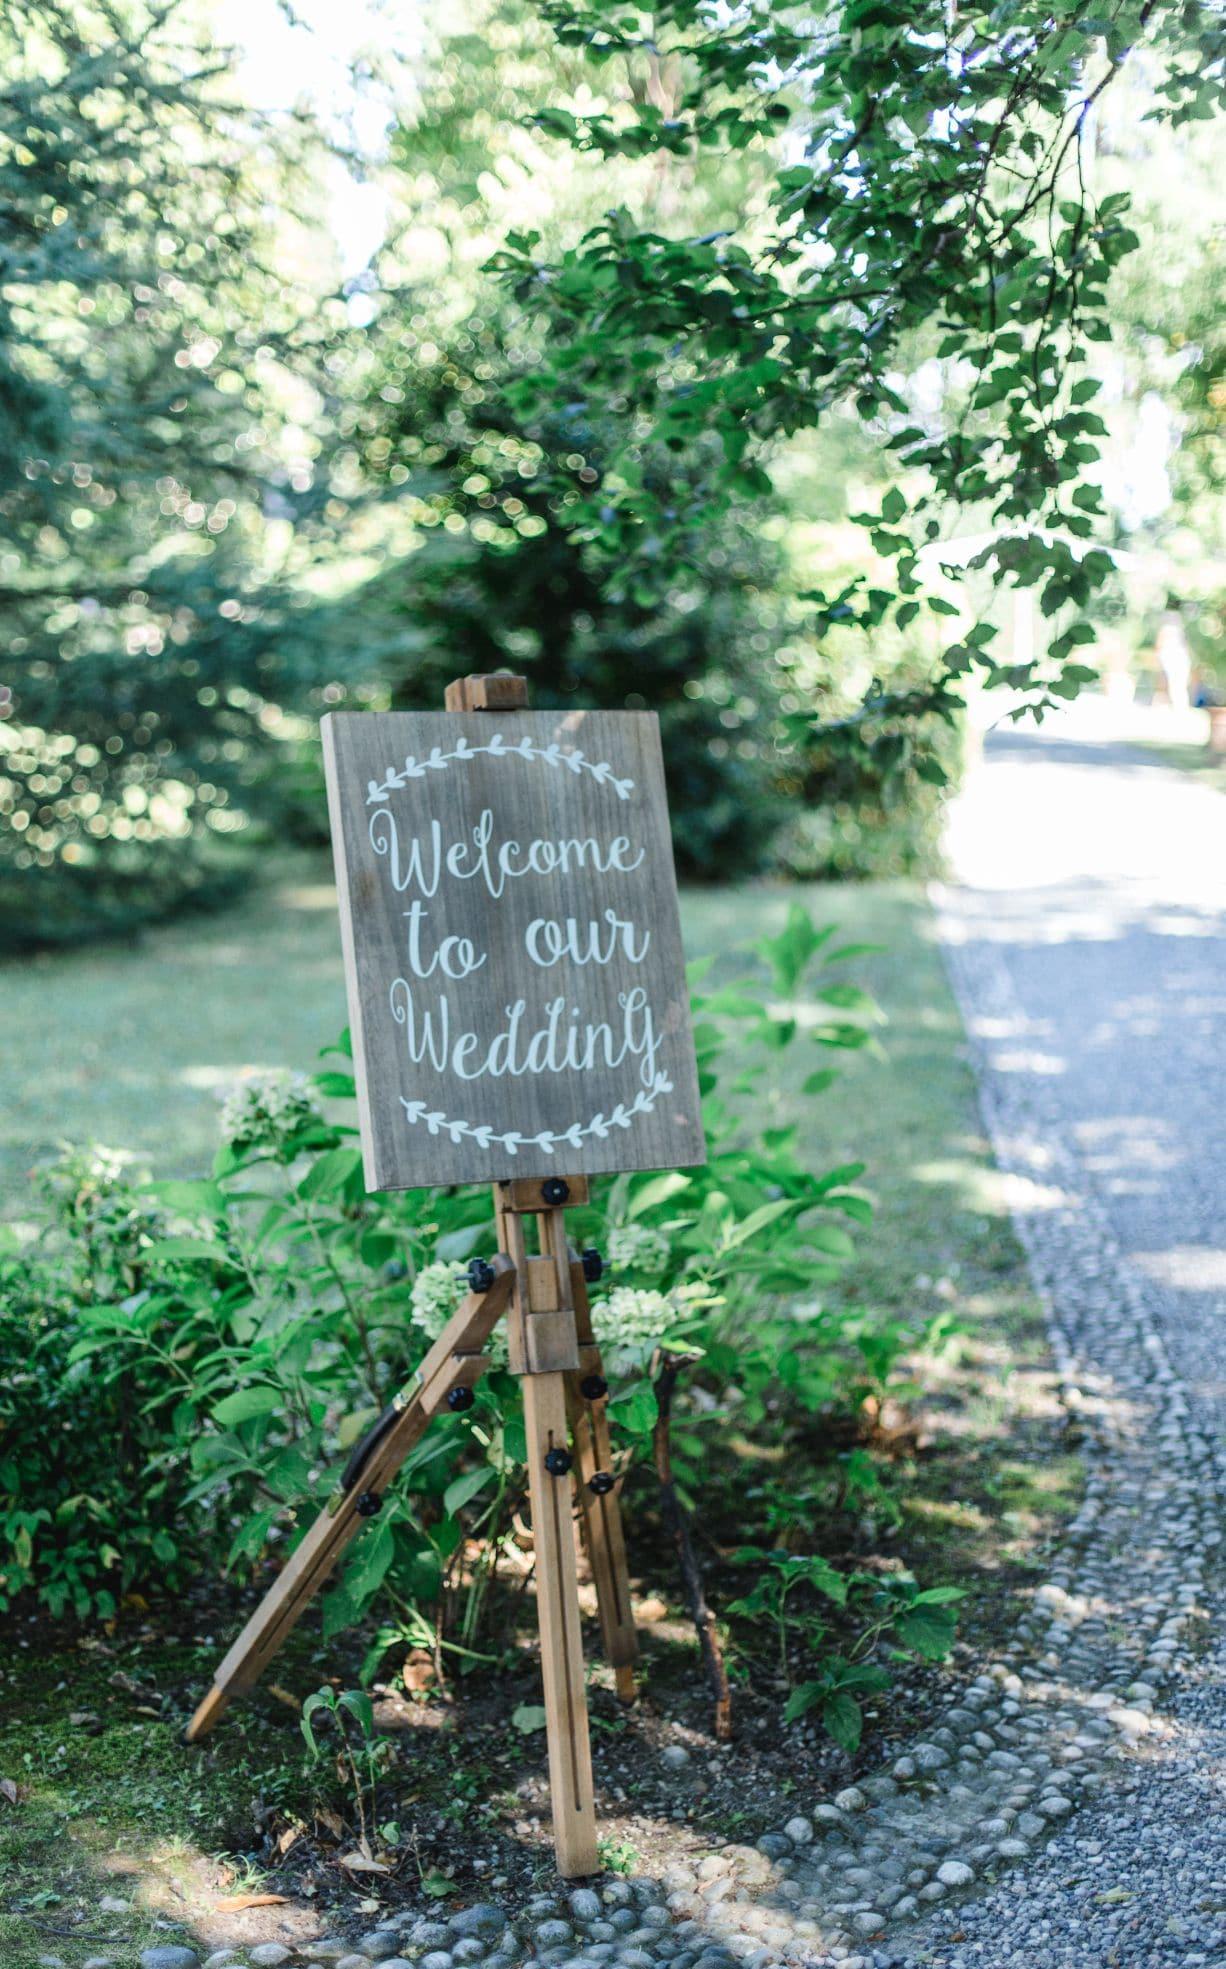 Million Memories_A&D_Hochzeitsfotograf_Schlosshochzeit_Toskana_Lago Di Como_Wedding_Tuscany_116